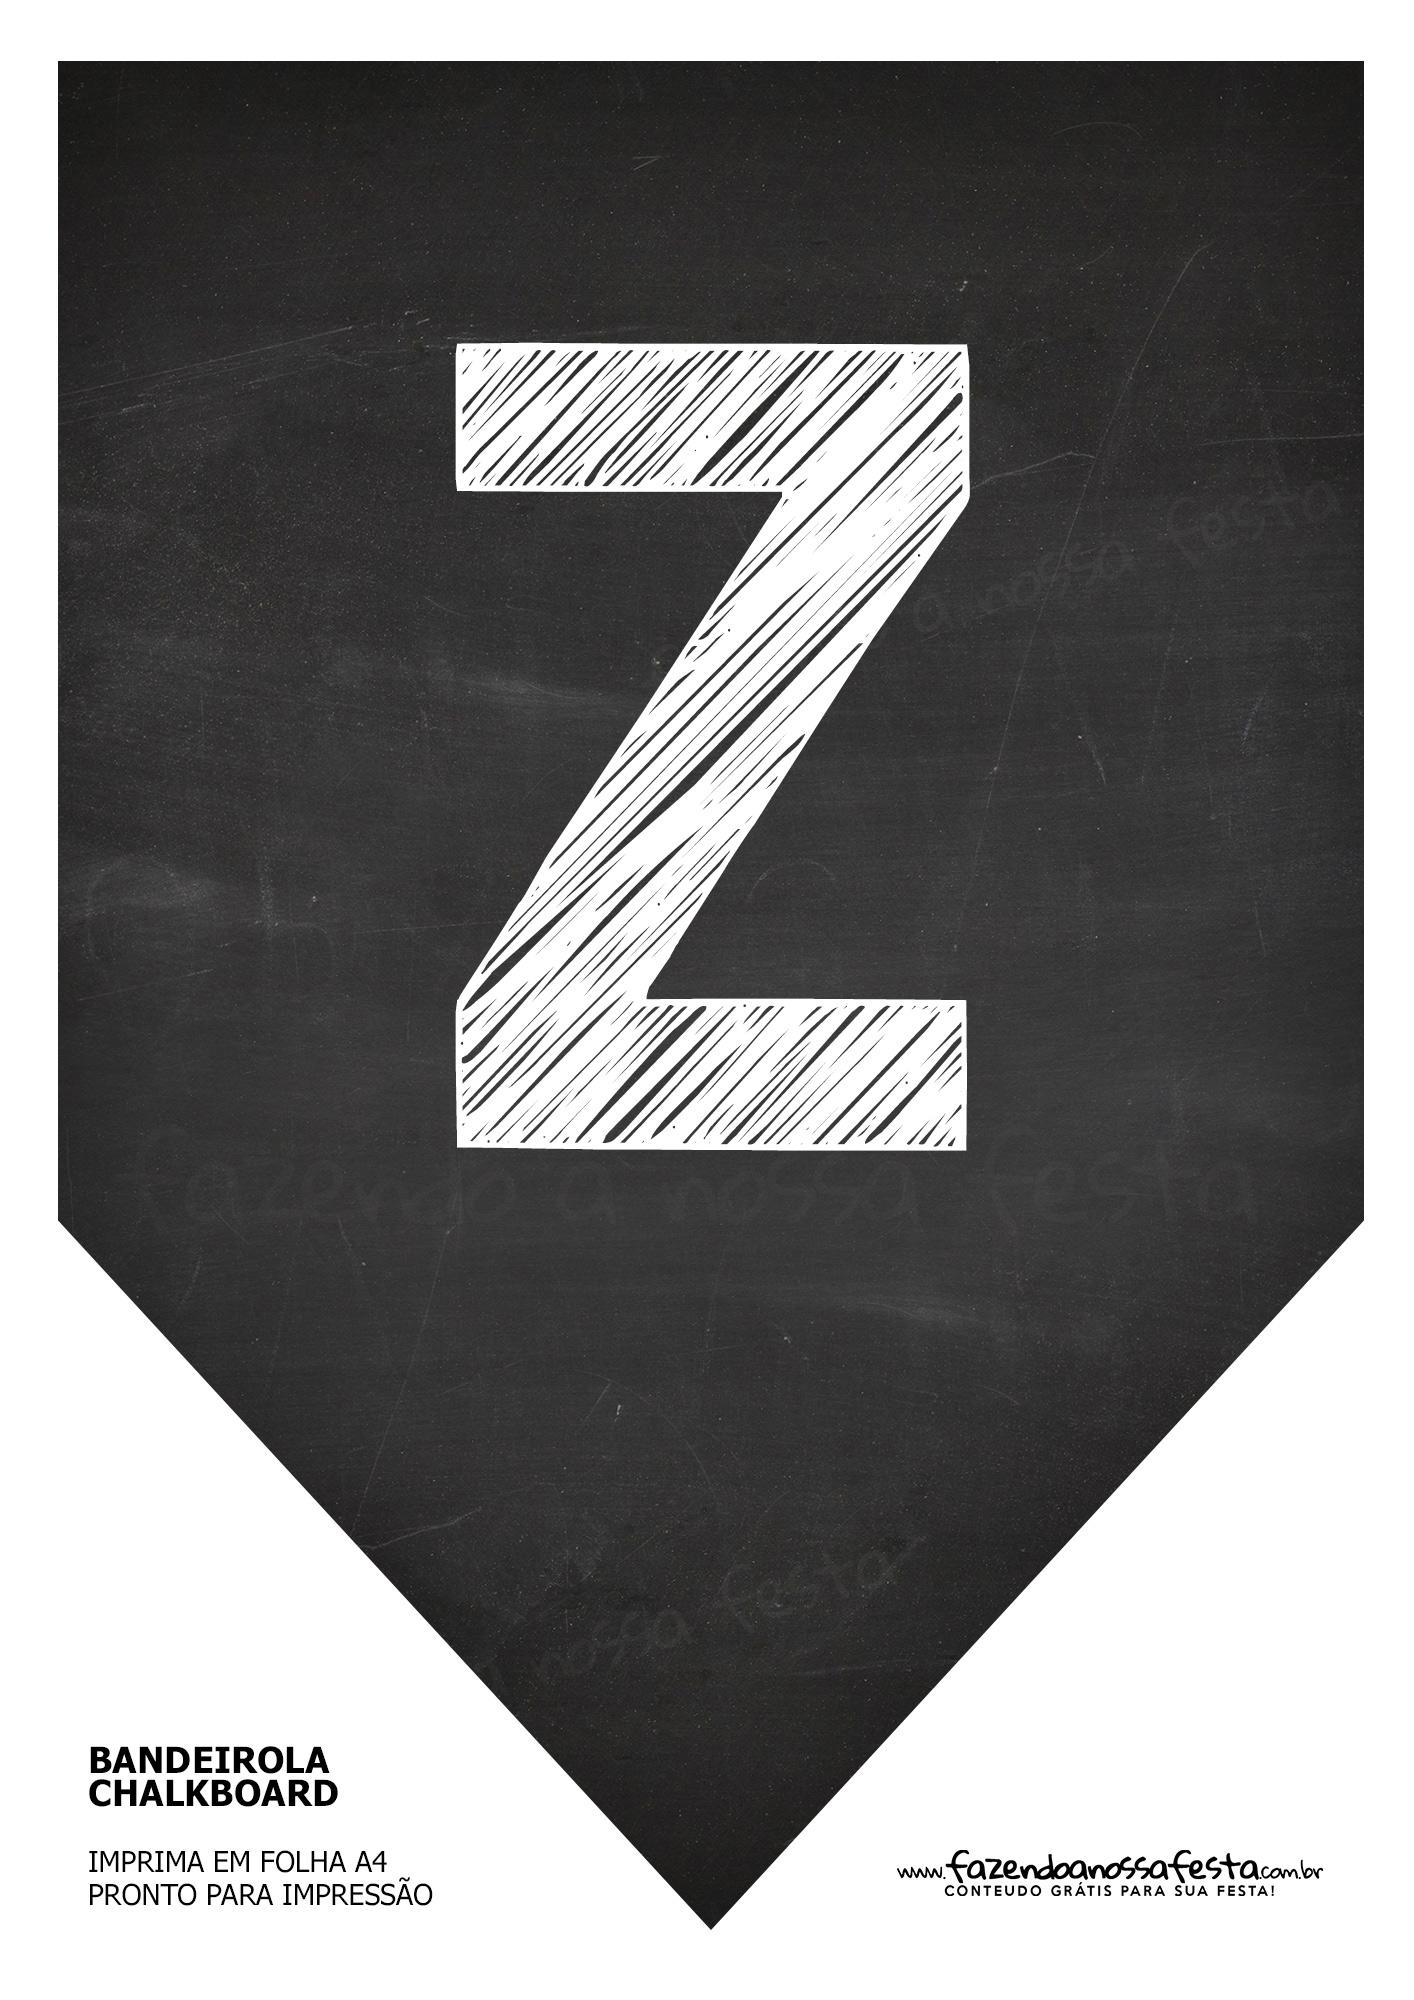 Bandeirinha Chalkboard Z